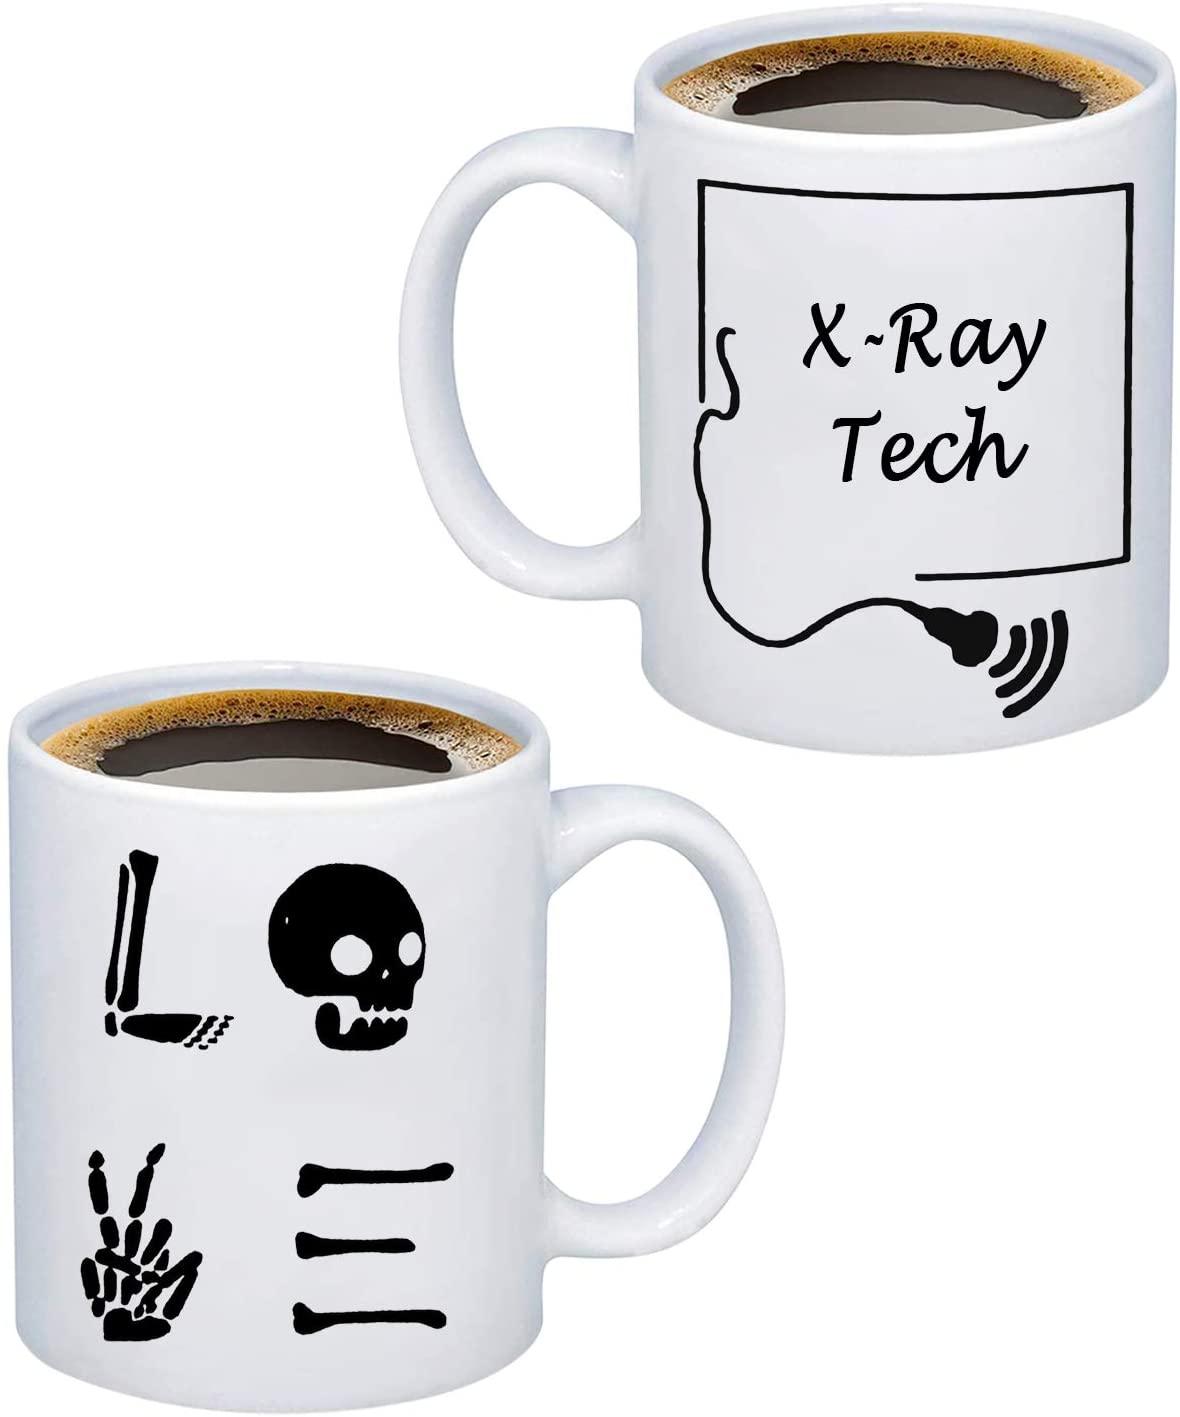 G2TUP Radiology Technician X Ray Tech Mug for Men Women Funny Coffee Mug Tea Mug Ray Tech Graduation Gift Appreciation Gift (X Ray Tech Mug)